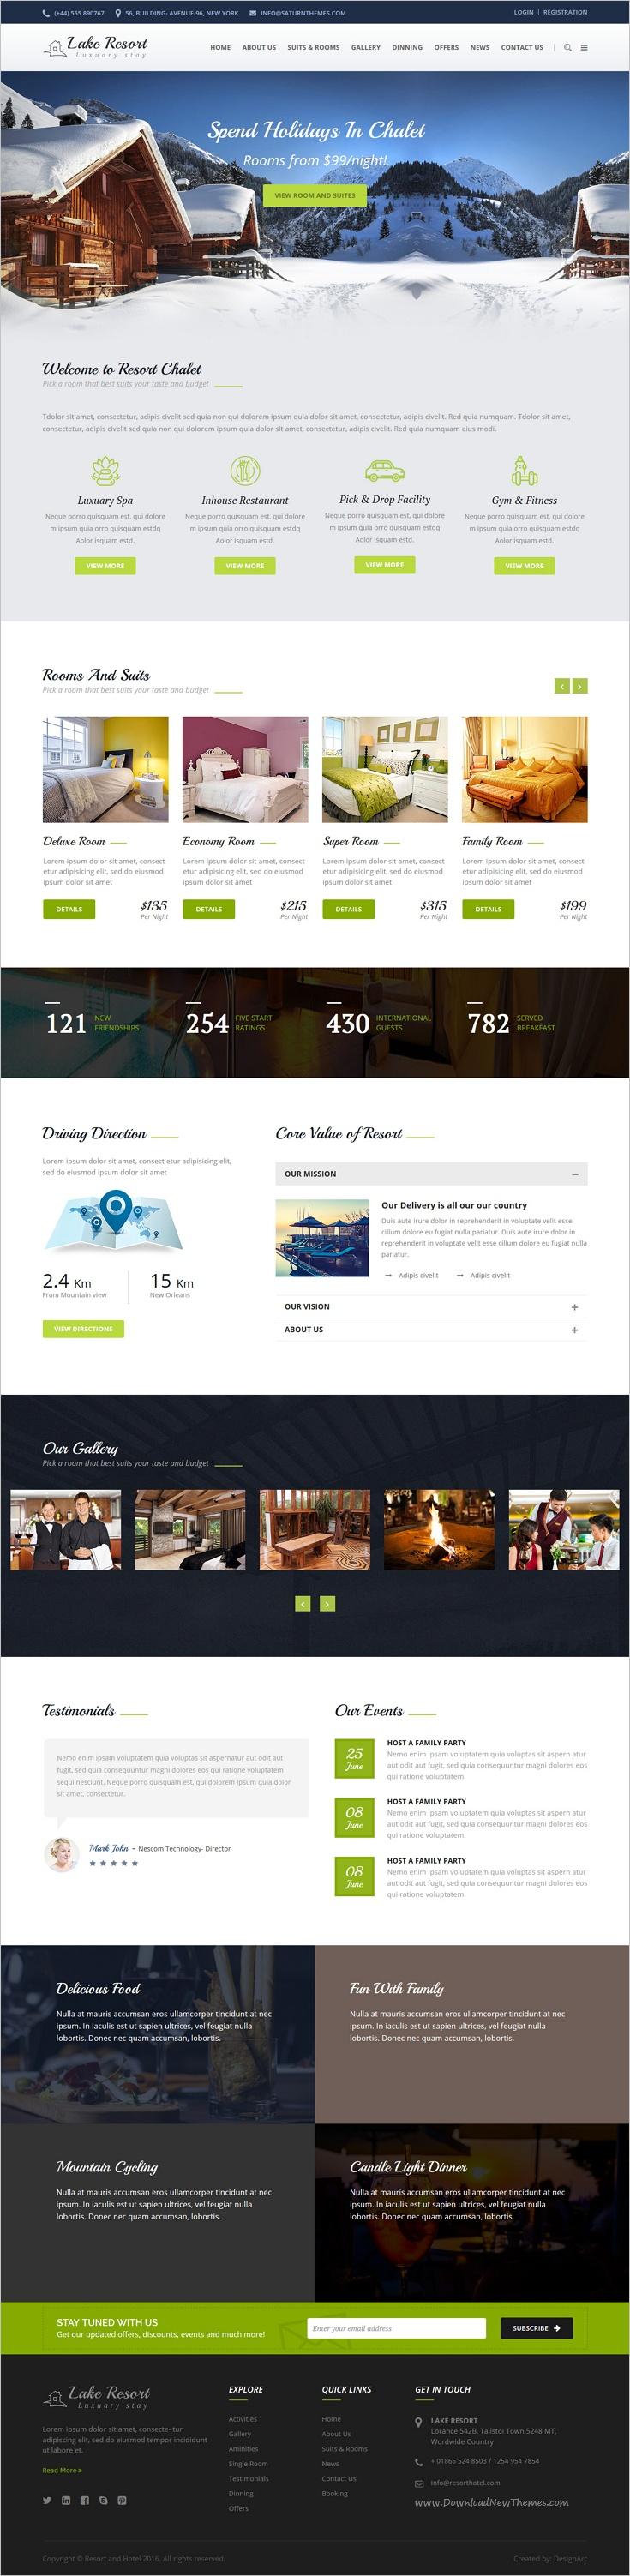 Lake Resort Resort And Hotel HTML Template Pinterest Lake - Html homepage template